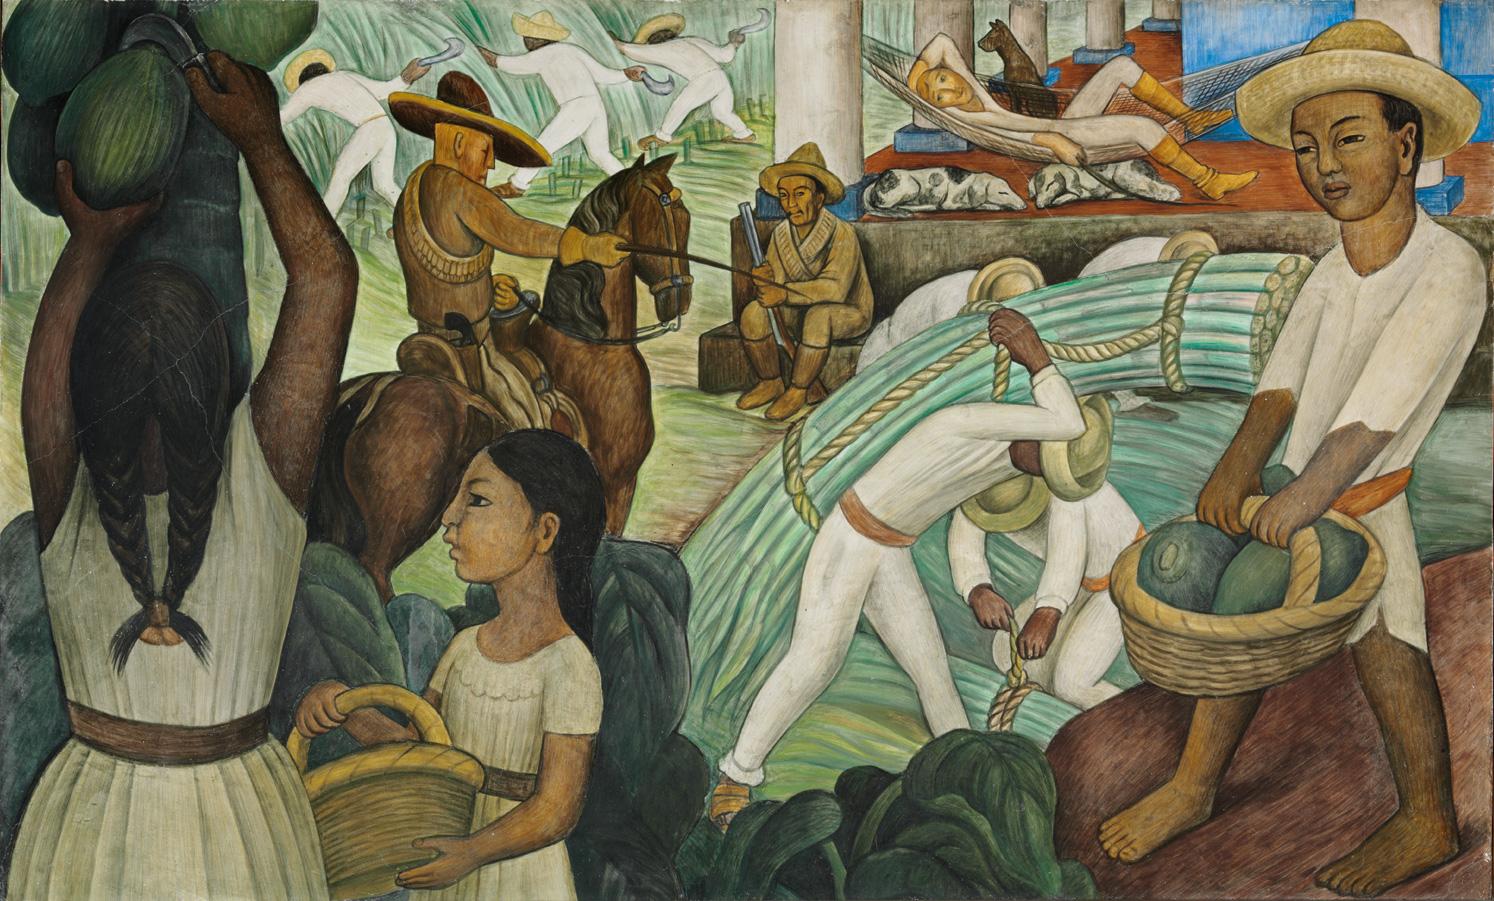 - Sugarcane, 1931, mural, fresco on concrete, Diego Rivera (1886-1957).